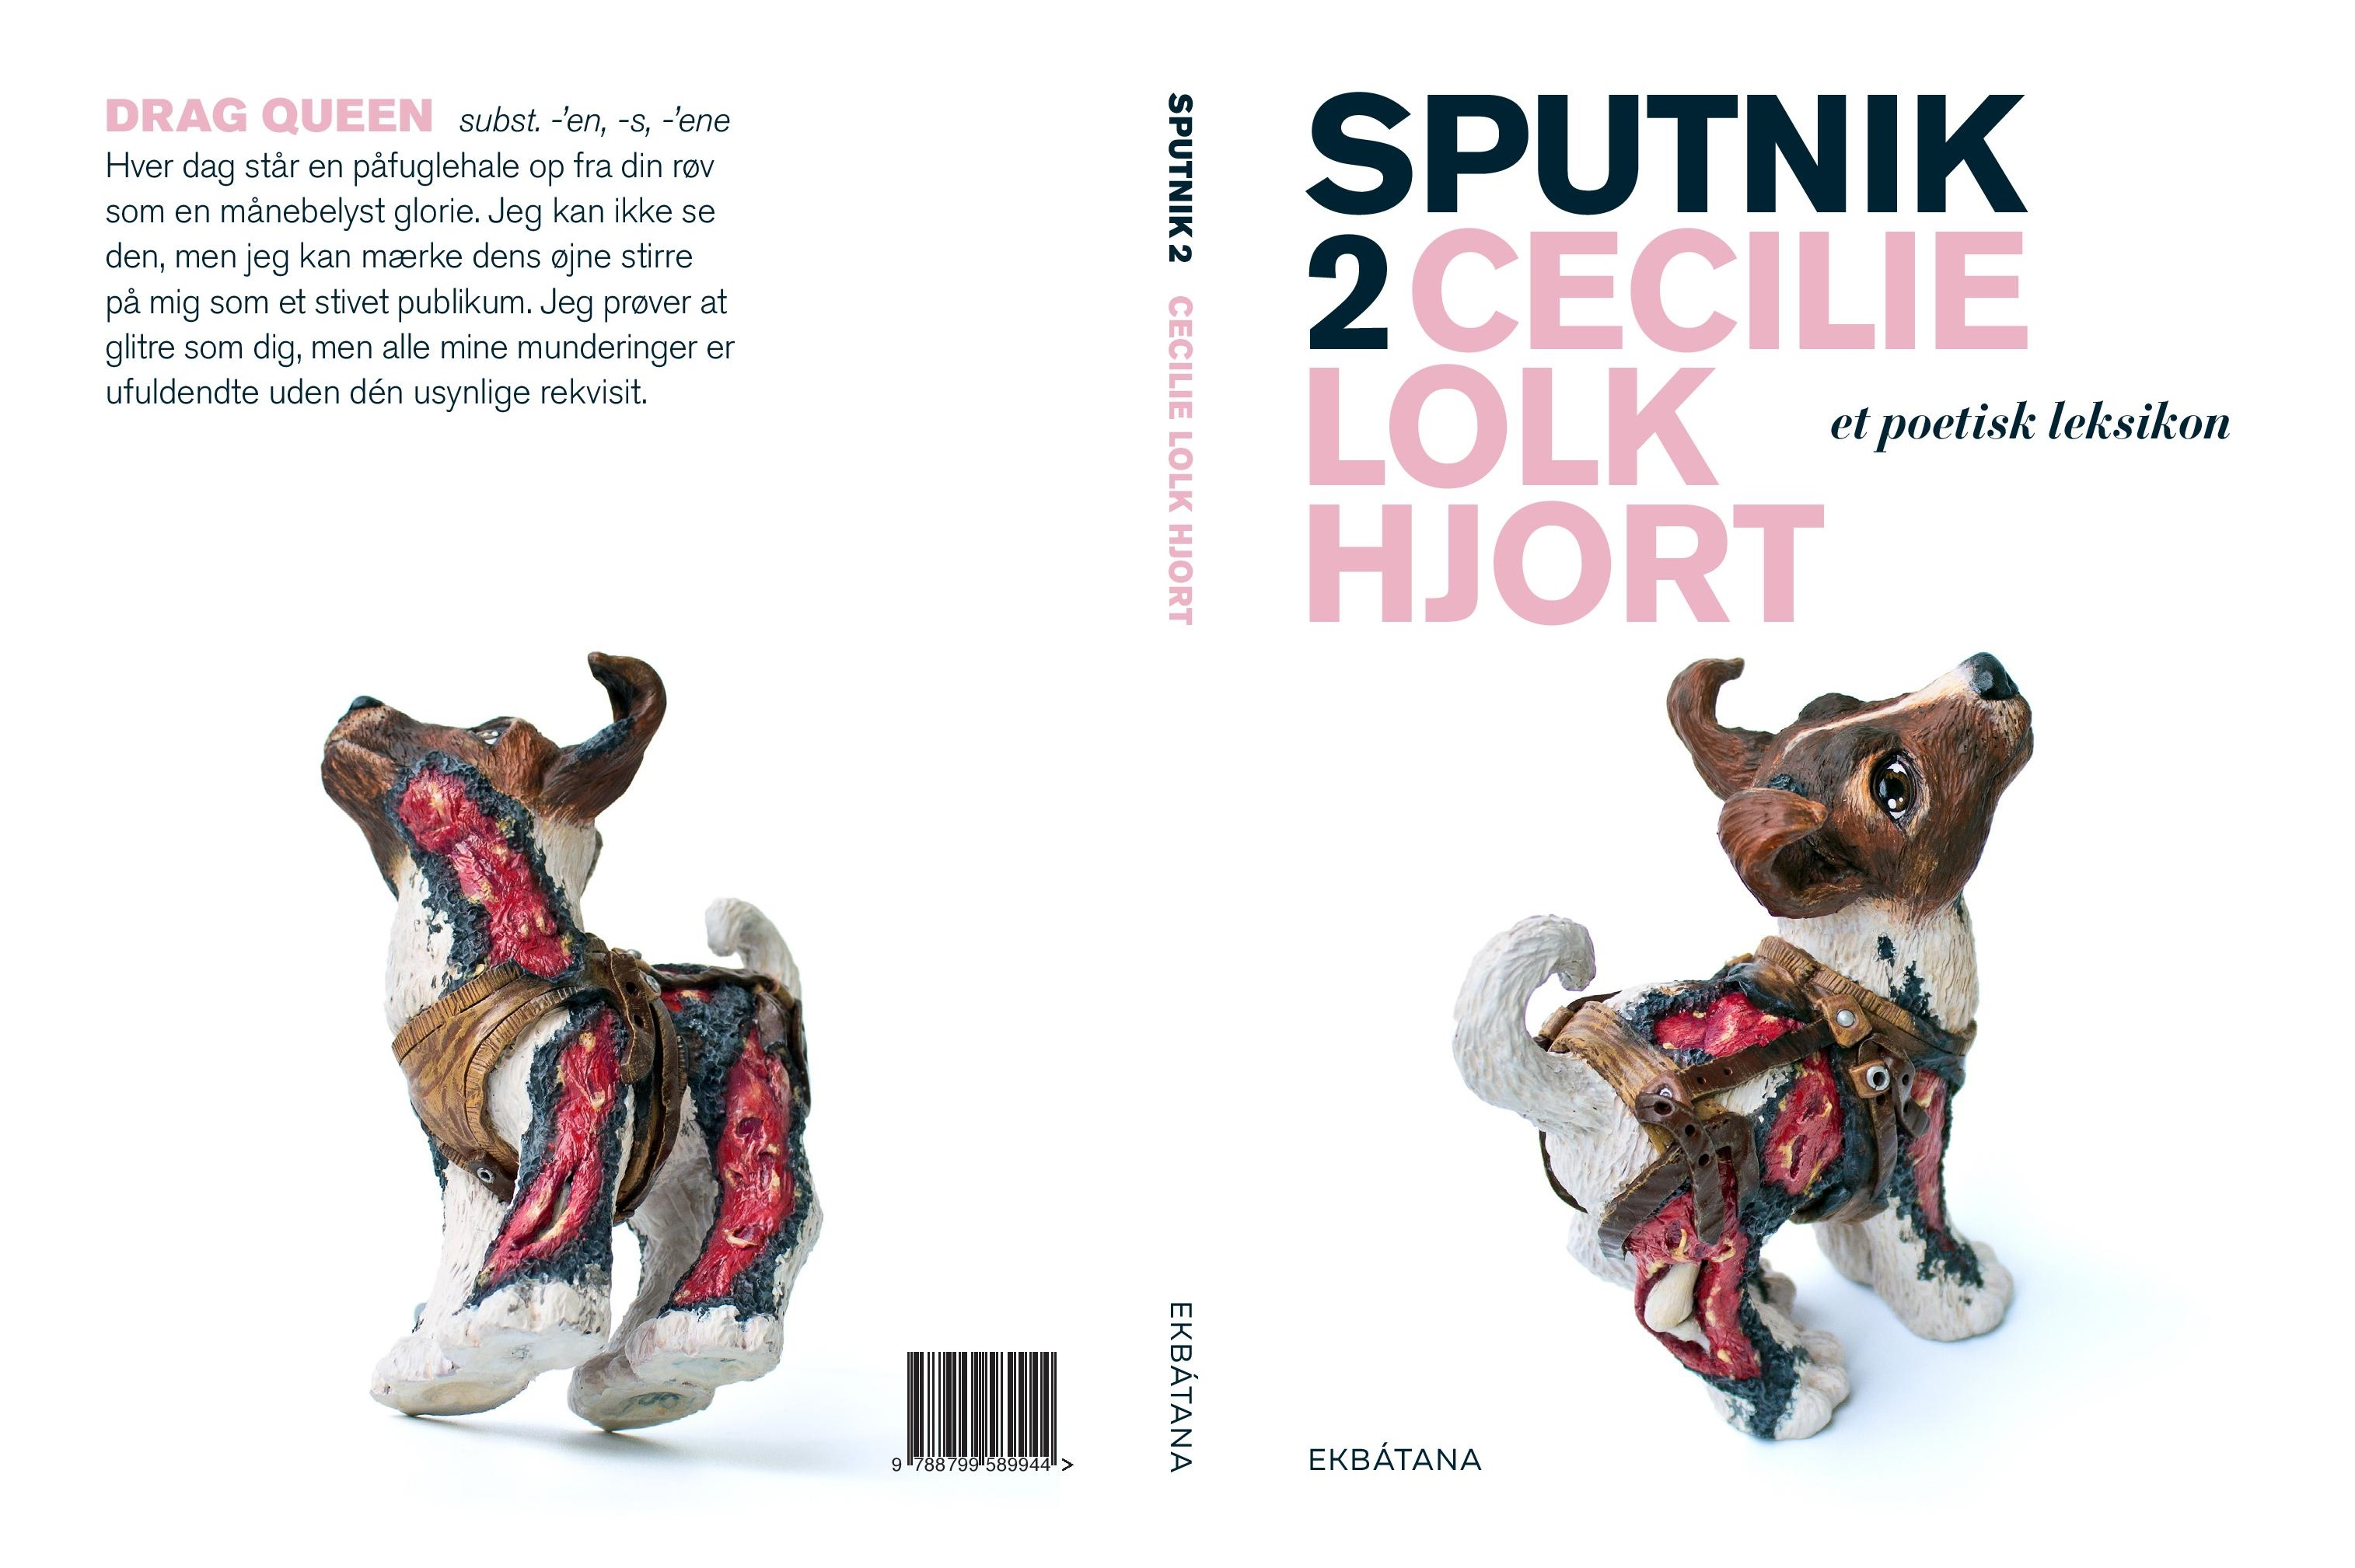 Cecilie Lolk Hjort, Sputnik 2, poetisk leksikon, Galathea kroen